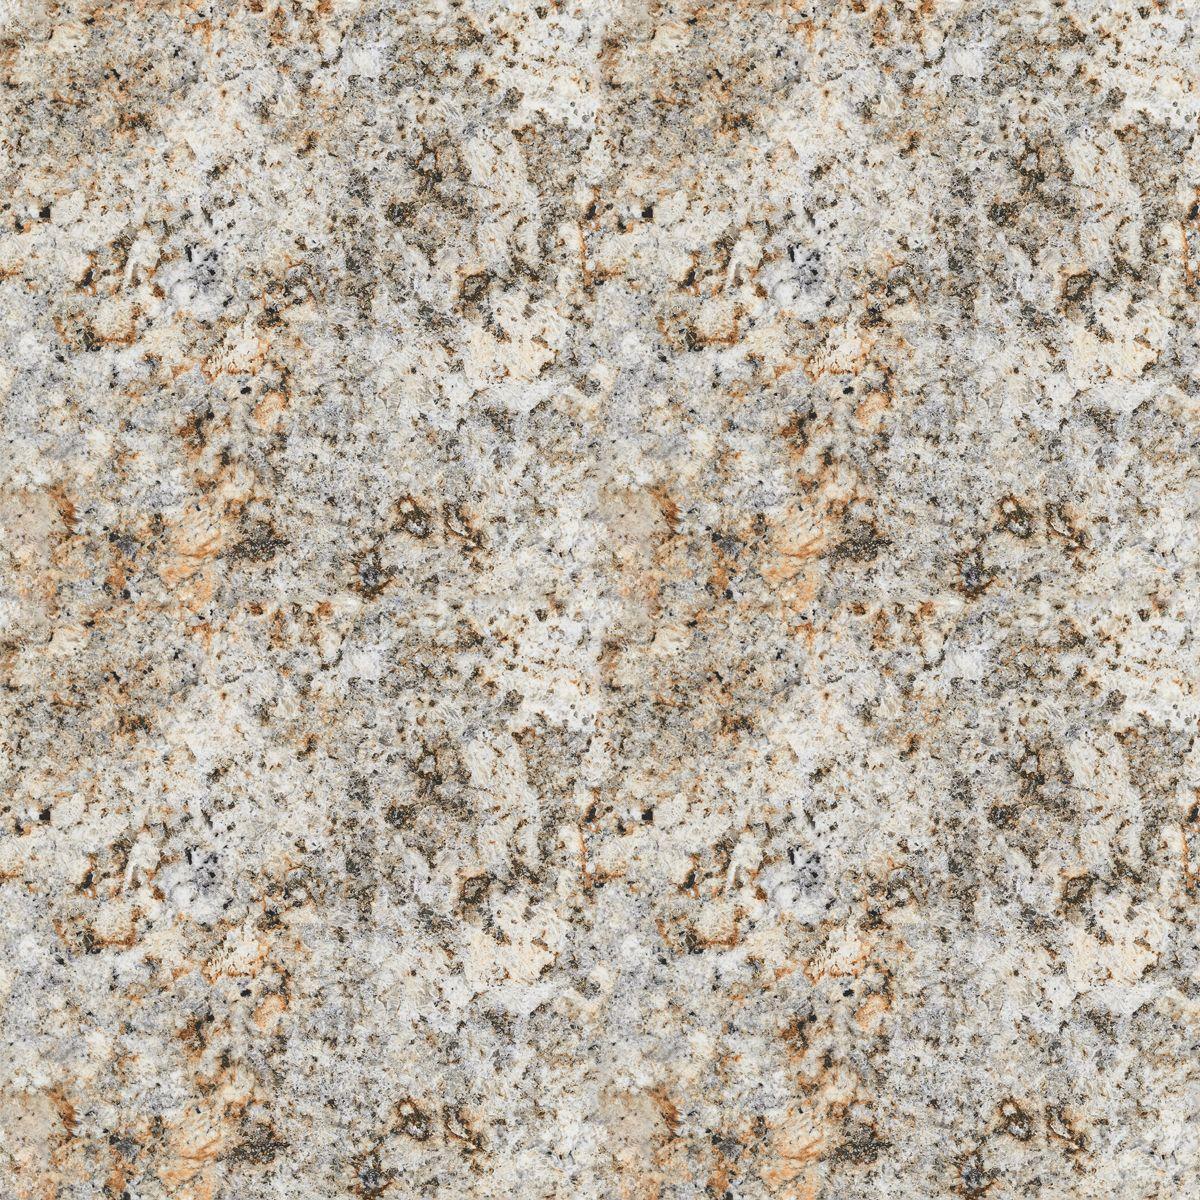 Geriba Gold Granite Formica Laminate Kitchen Countertops Laminate Kitchen